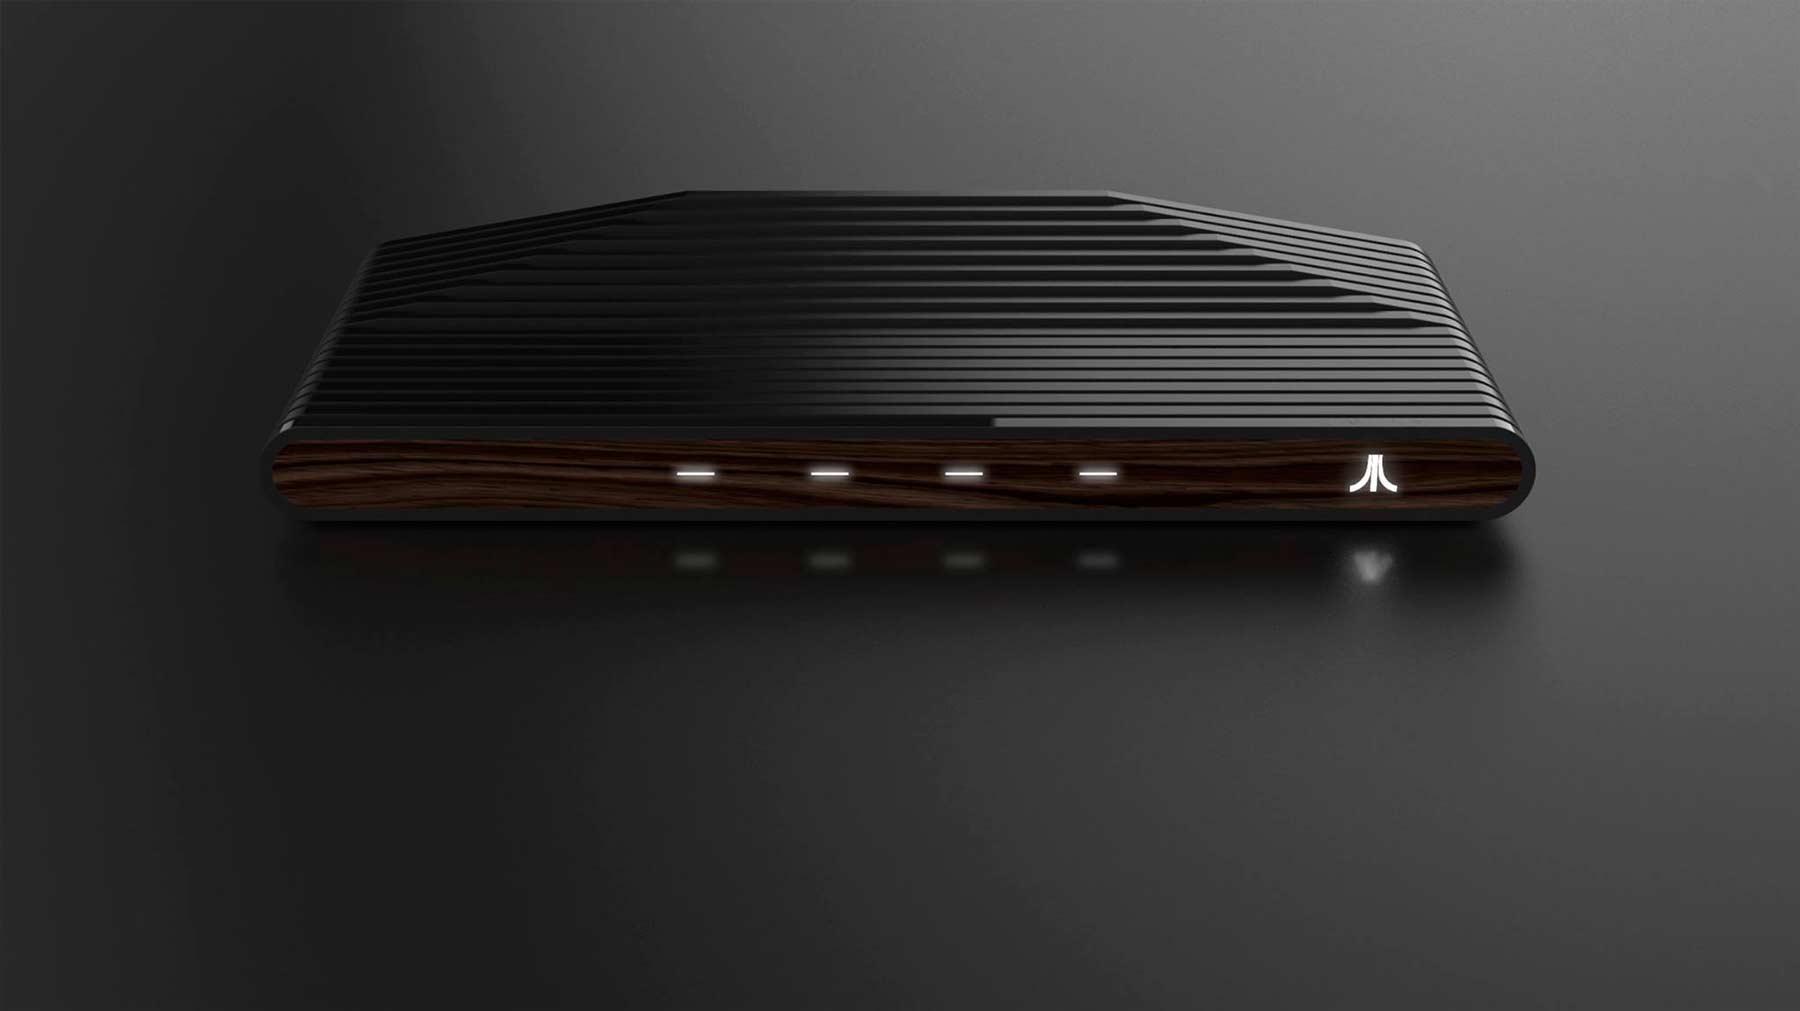 So soll die neue Atari-Konsole aussehen Ataribox_02